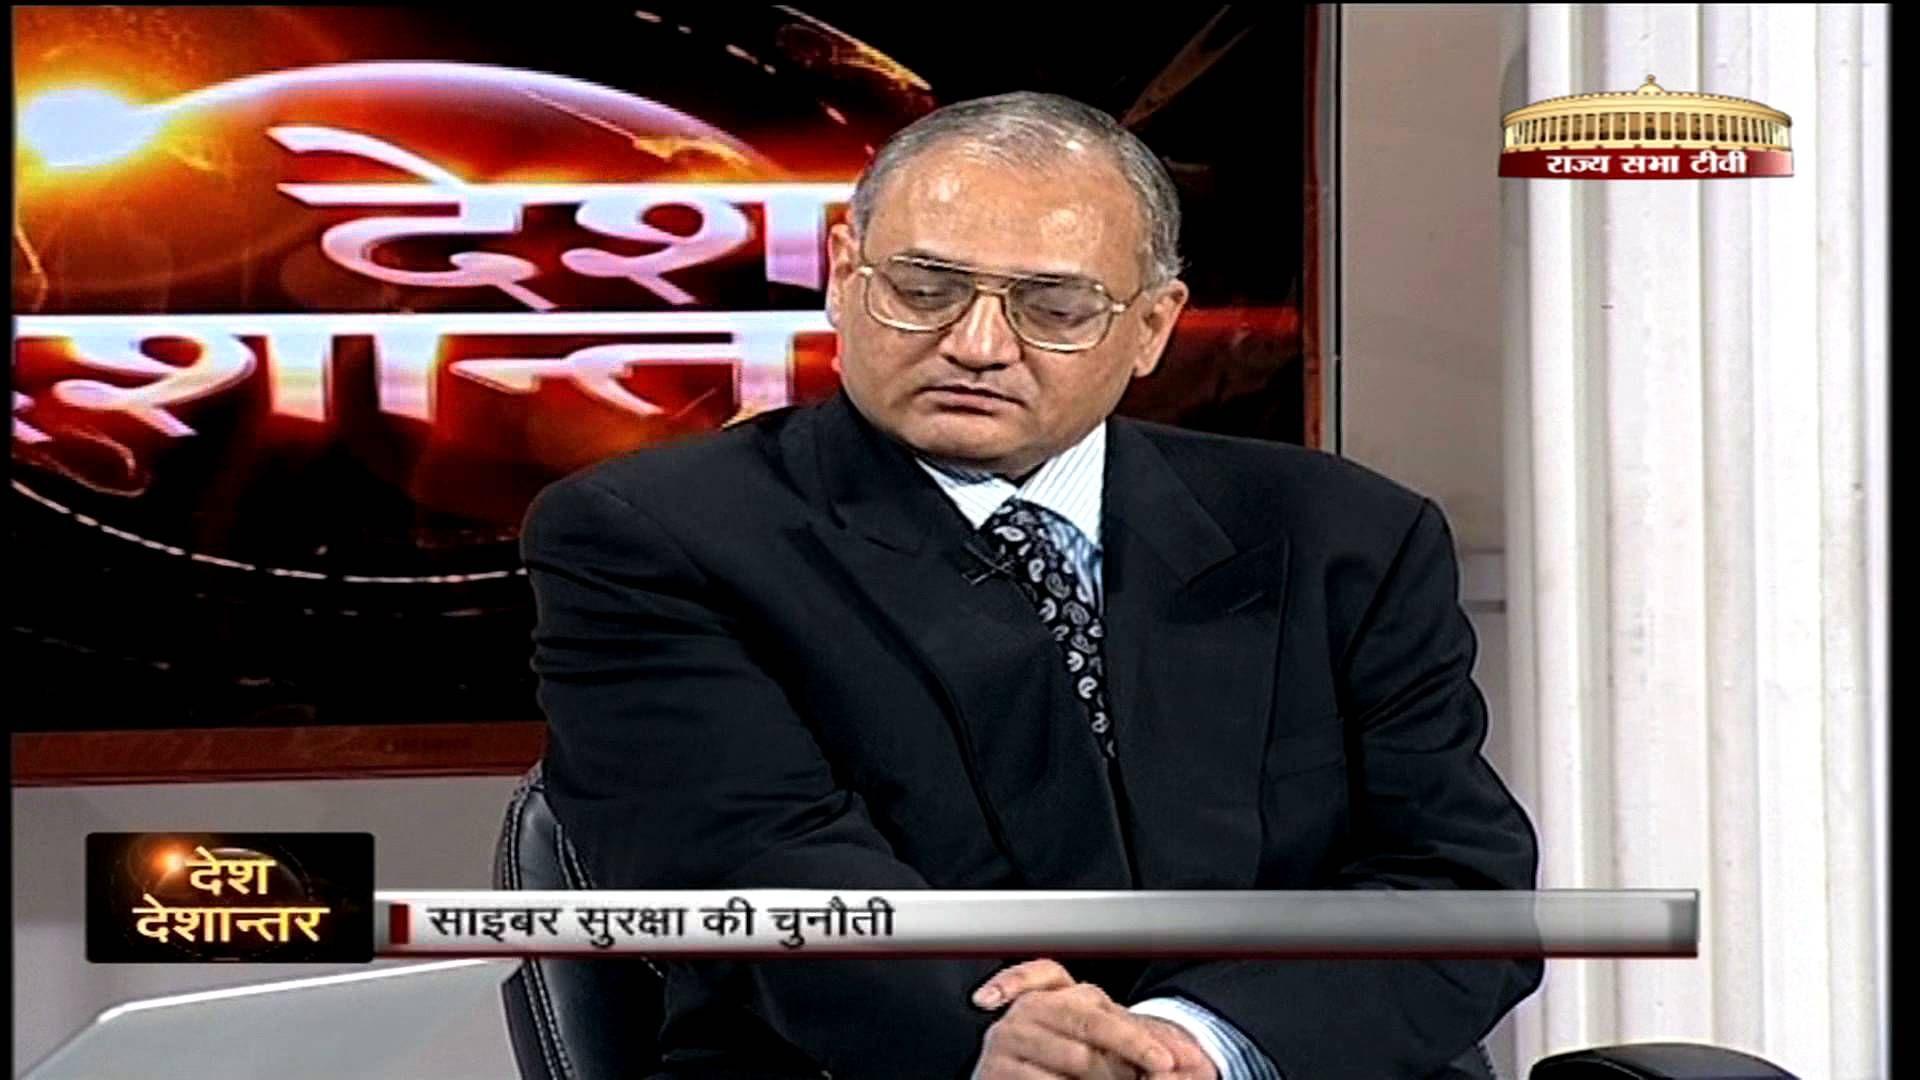 Desh Deshantar Cyber security mechanism in India Rajya